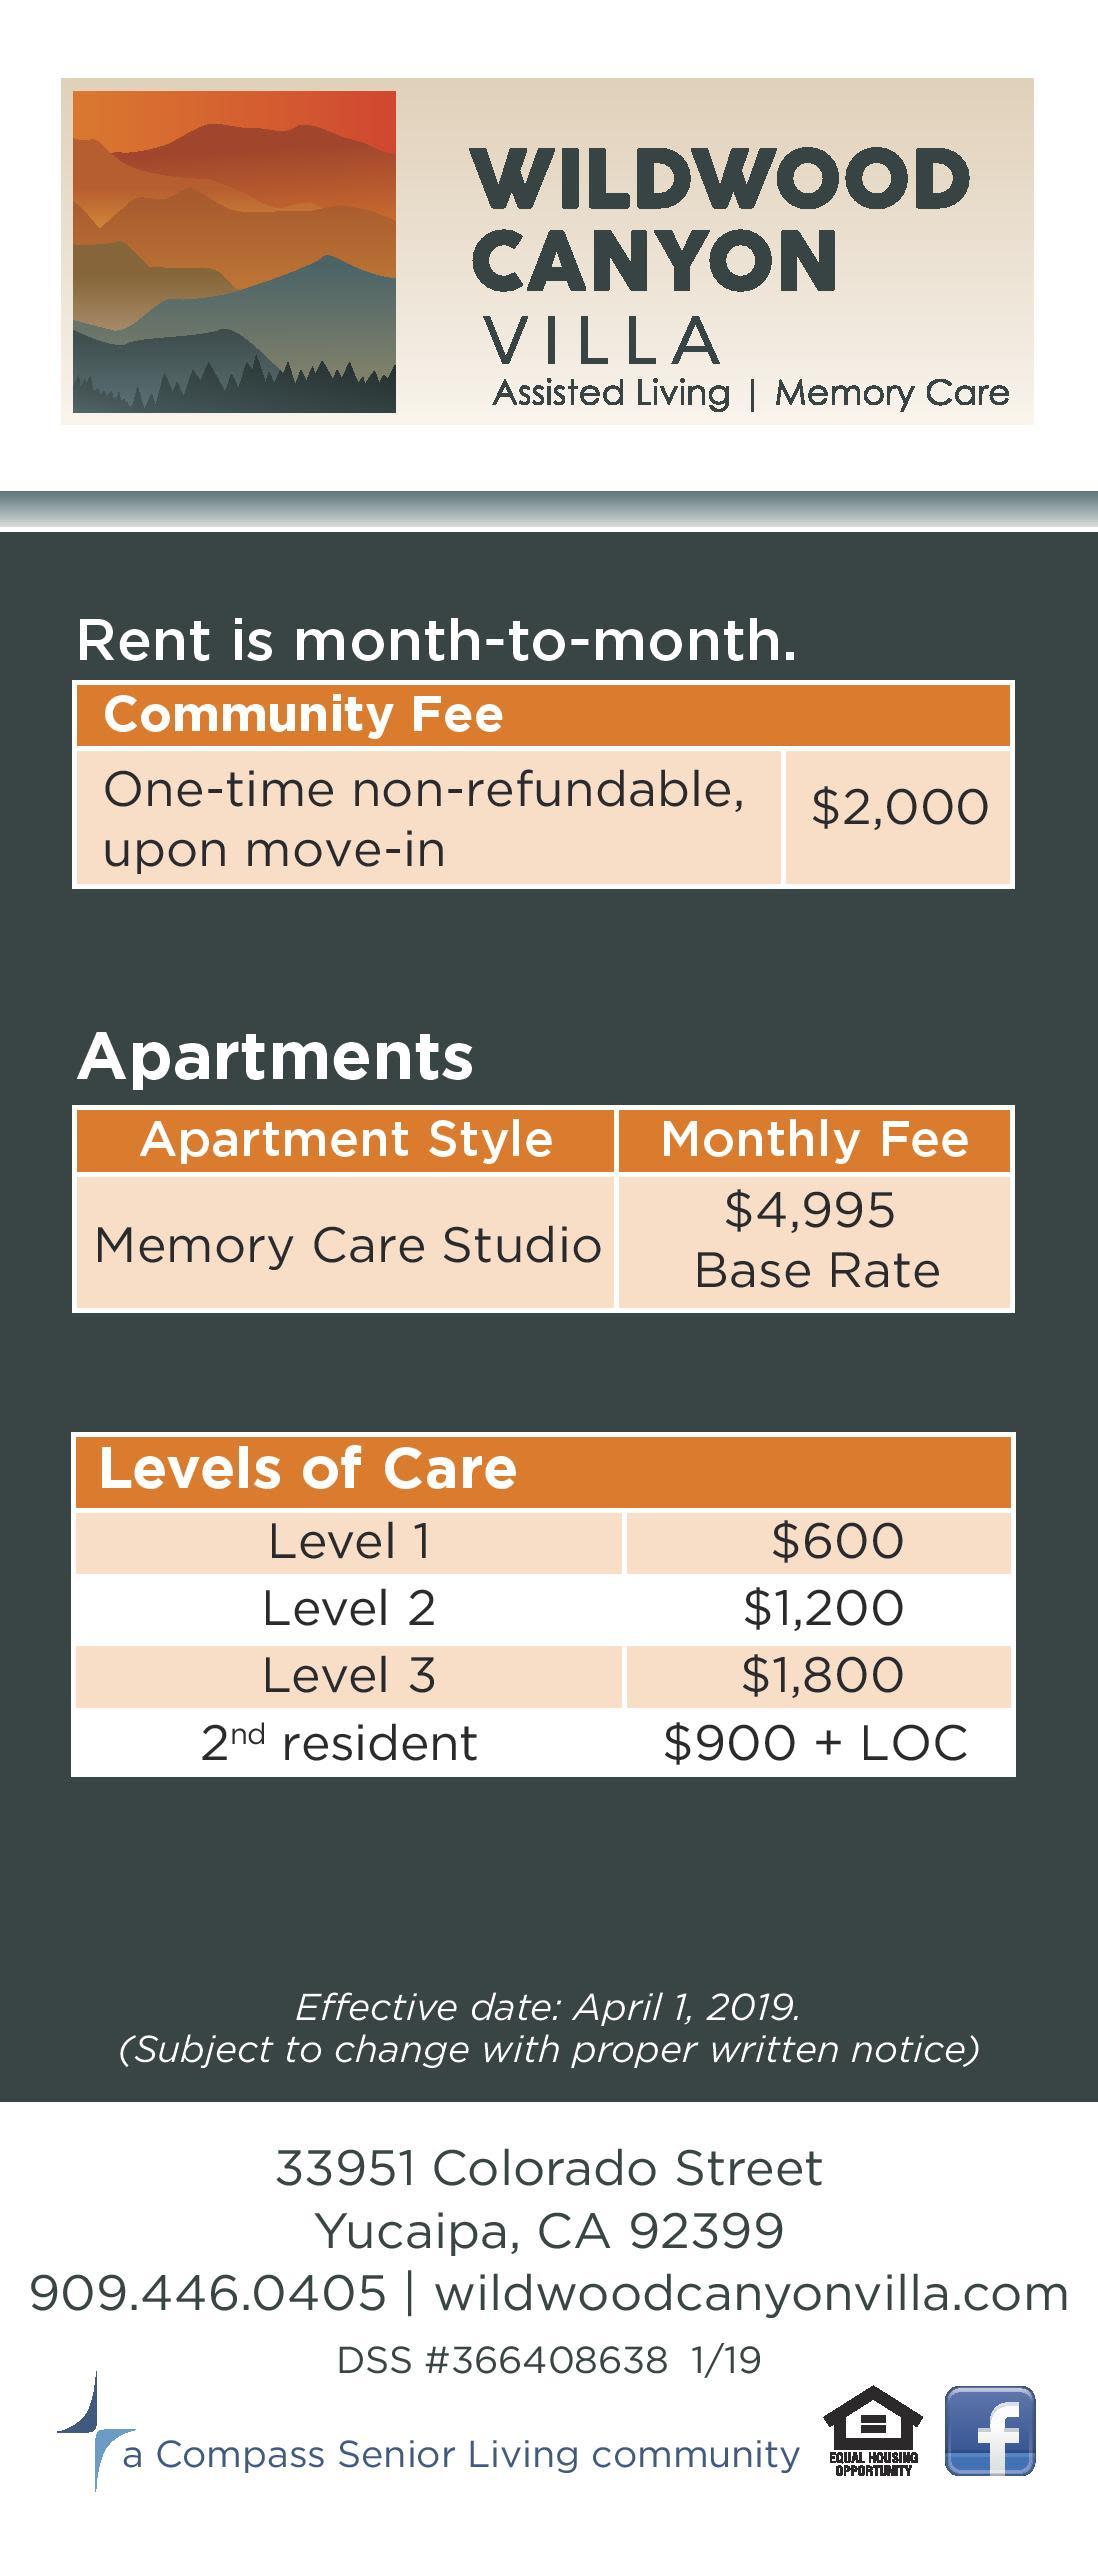 Memory care rates at Wildwood Canyon Villa Assisted Living and Memory Care in Yucaipa, California